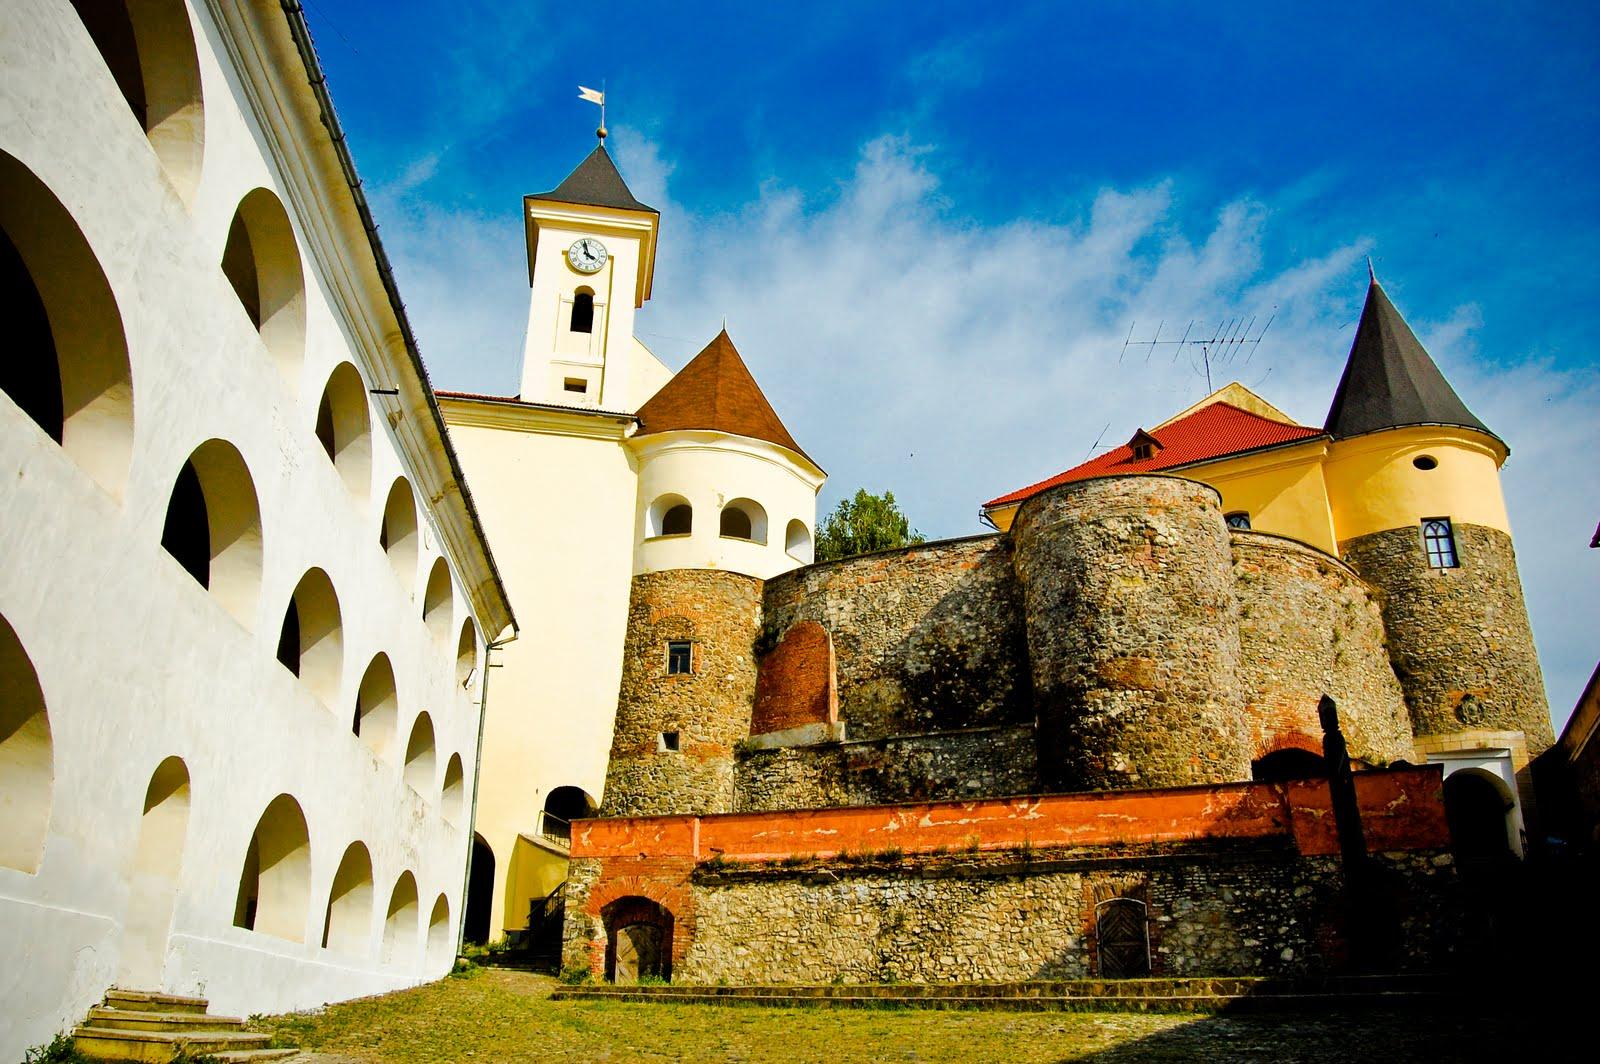 Закарпатські обранці перейменували назву міста Мукачеве